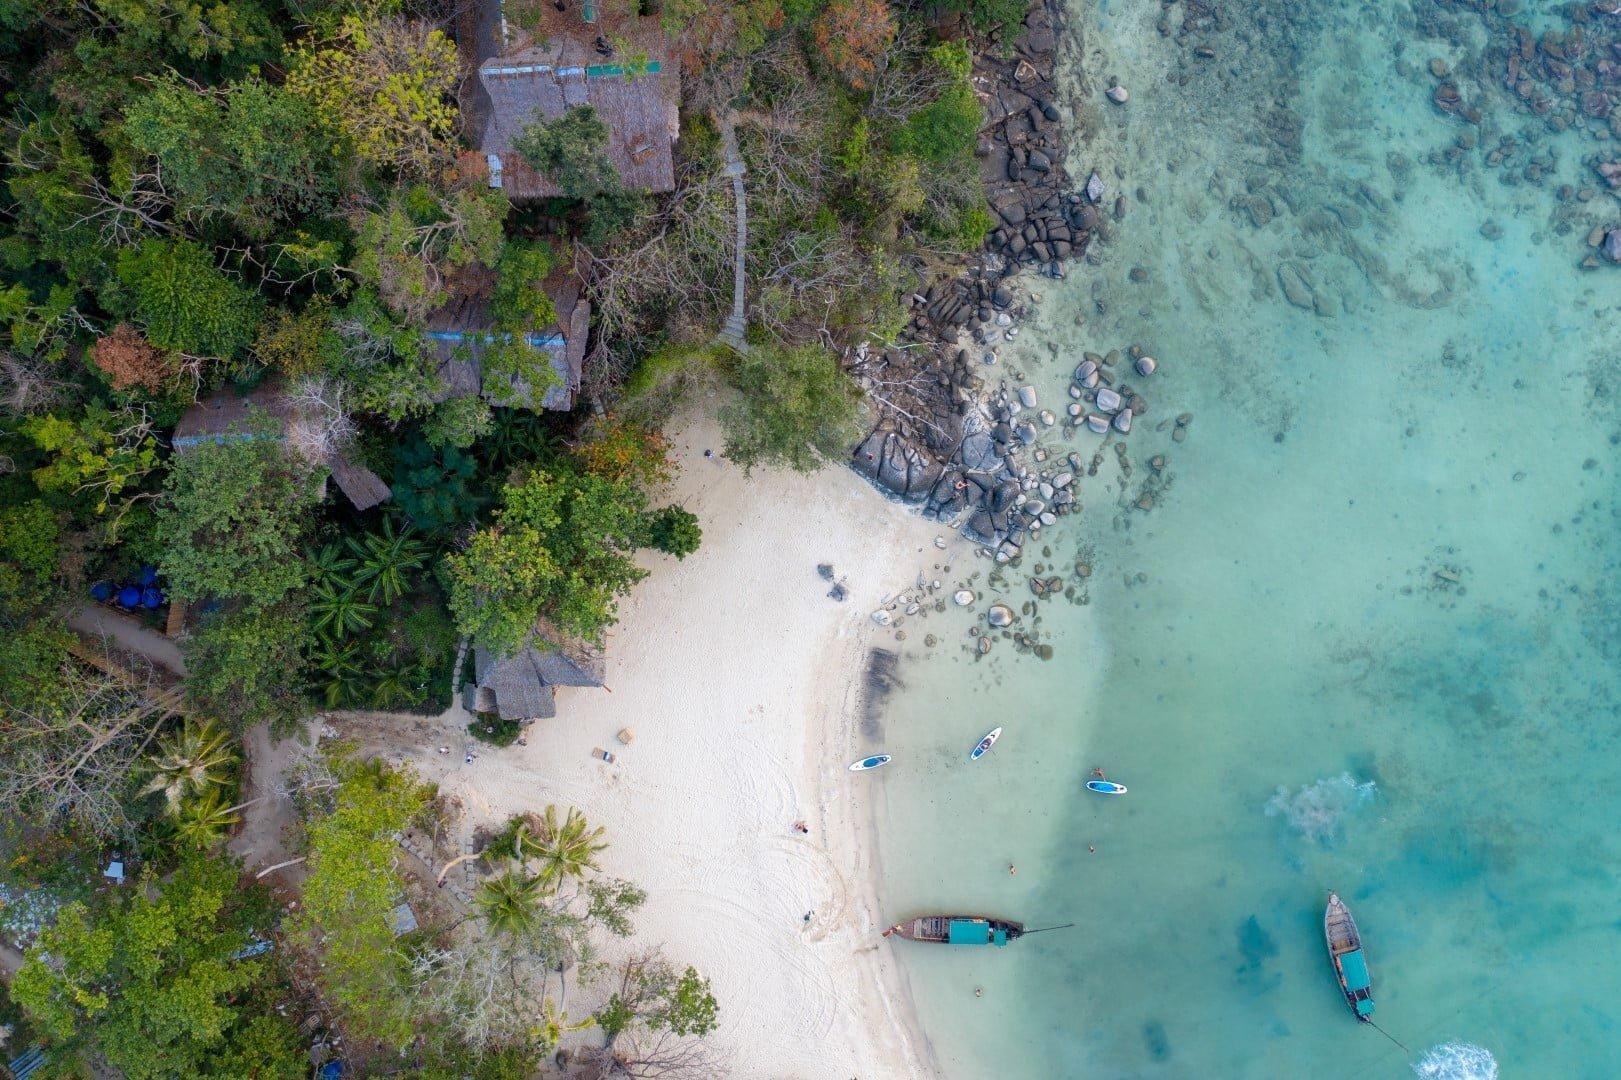 In search of remote, untouristy beach.